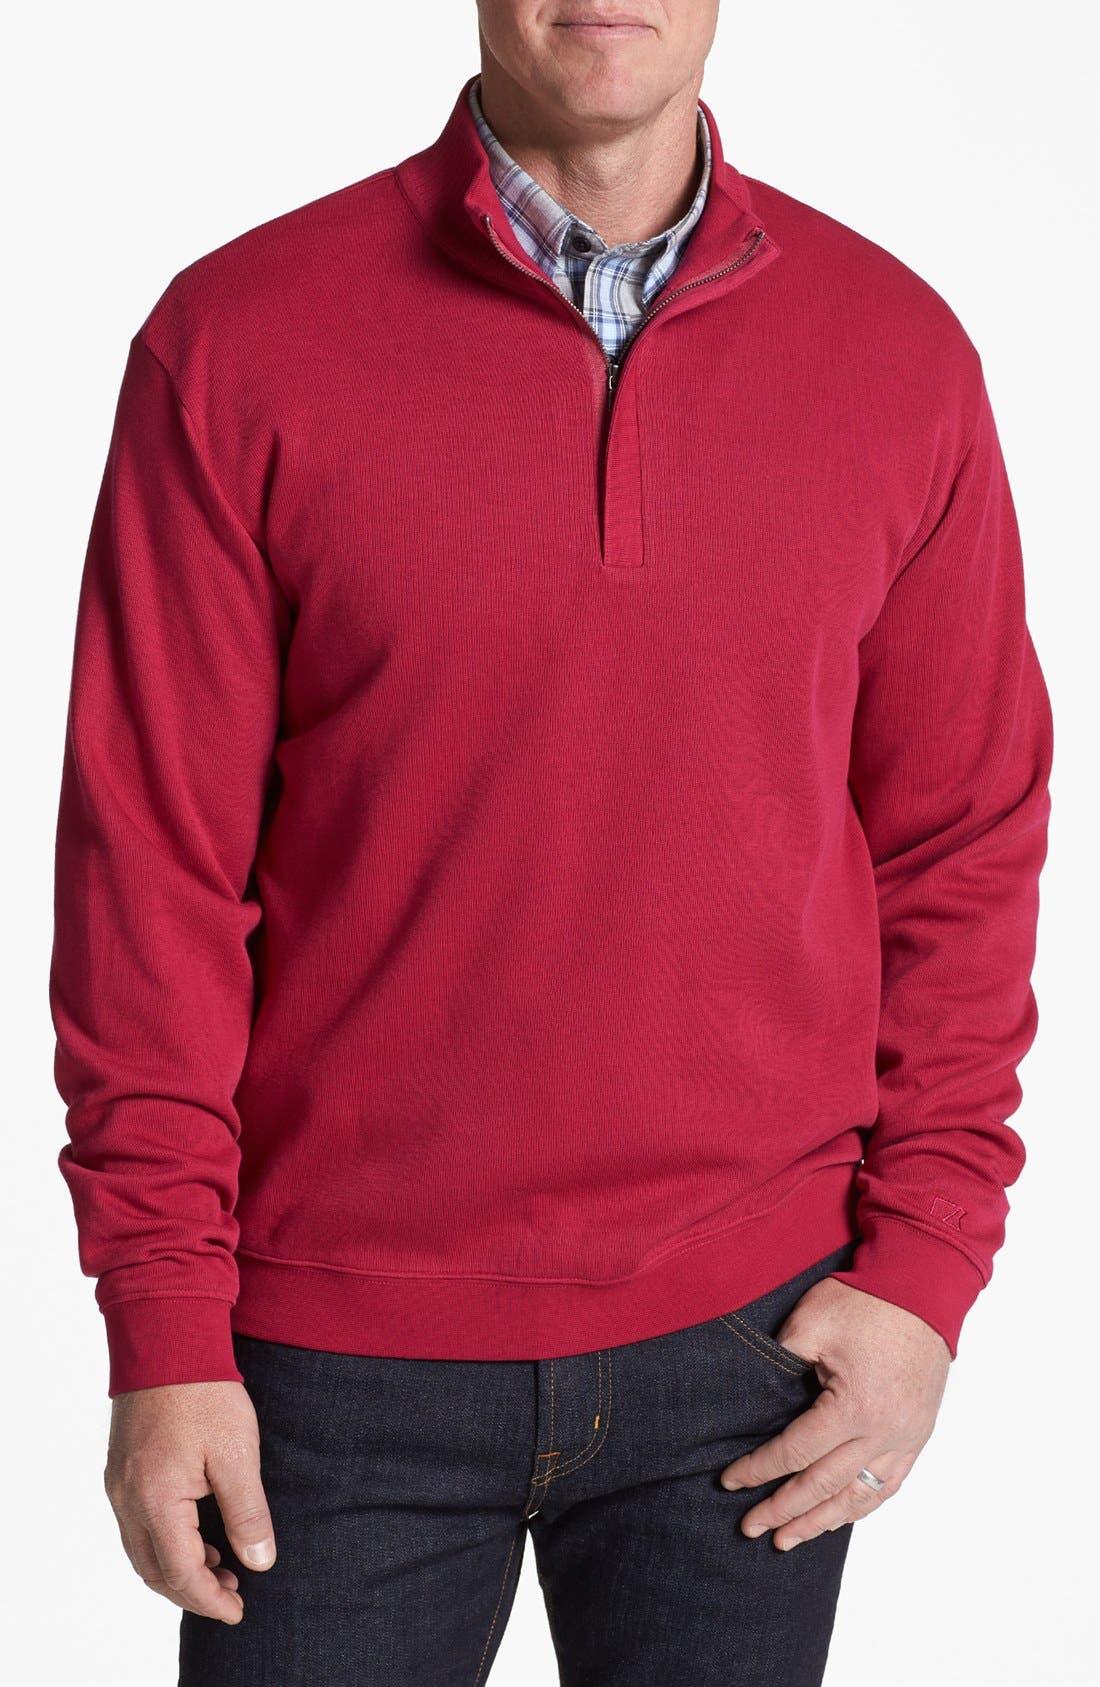 Main Image - Cutter & Buck 'Flatback' Pullover Sweatshirt (Big & Tall)